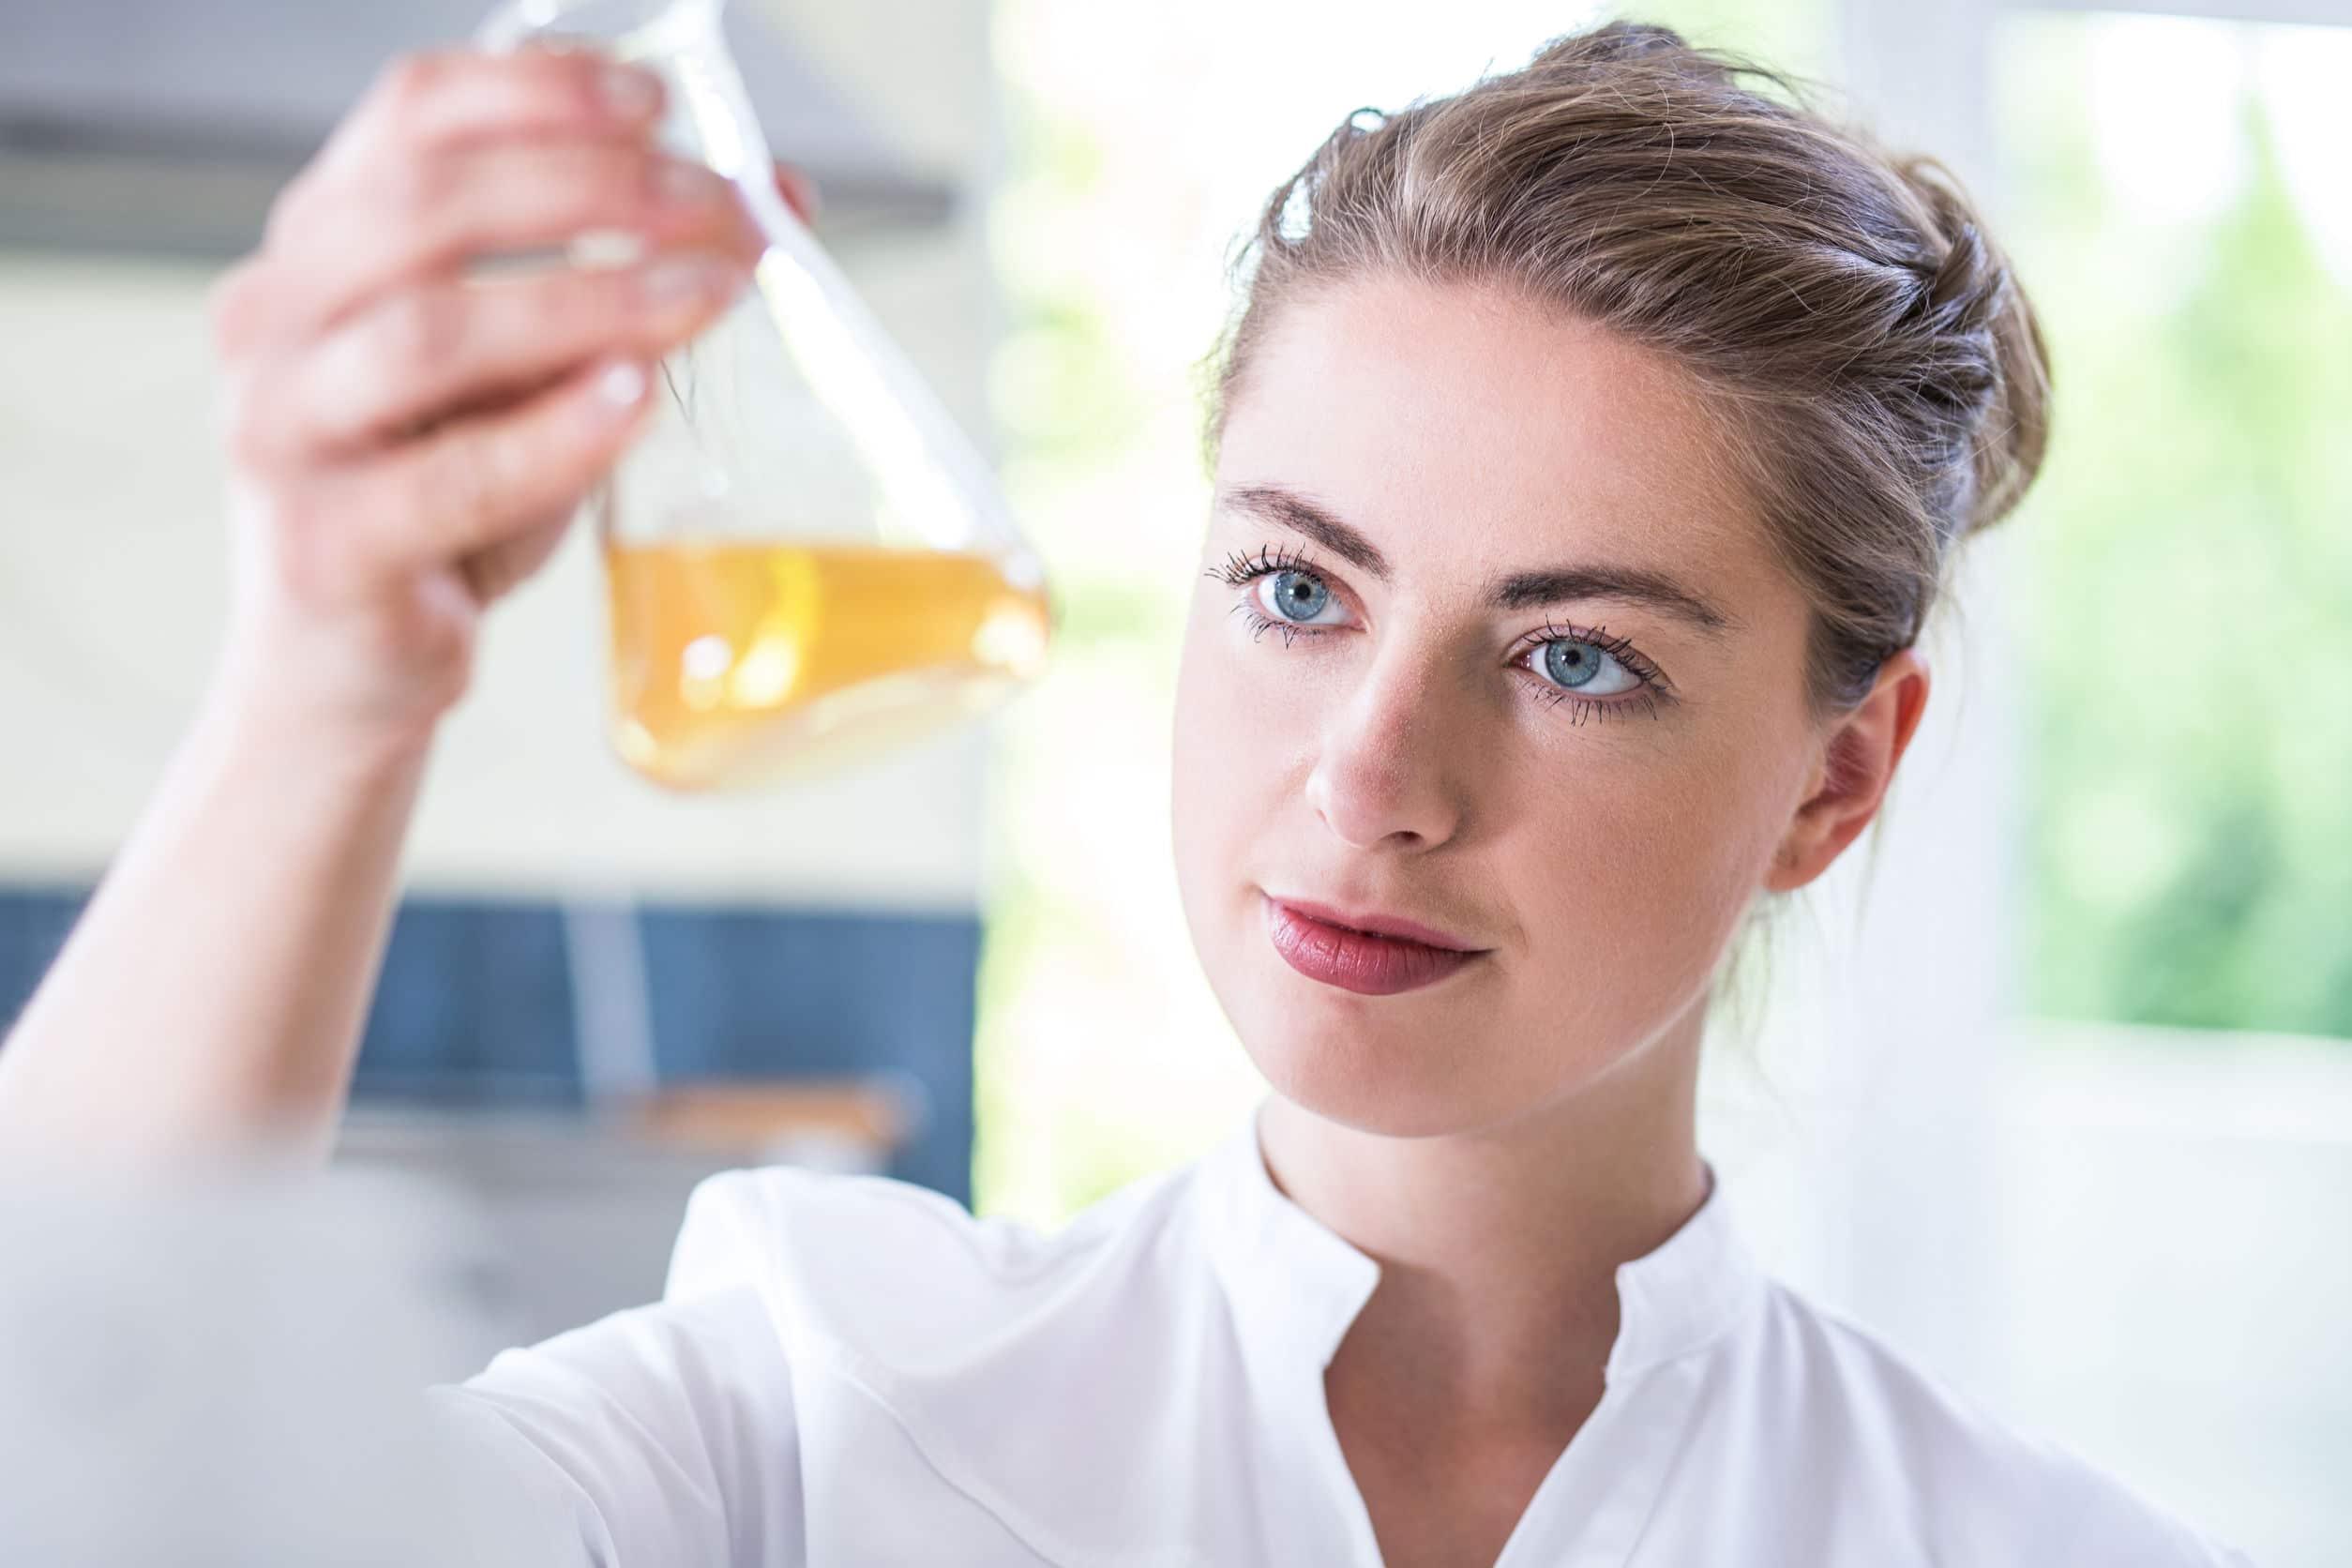 batterie urine énergie humaine